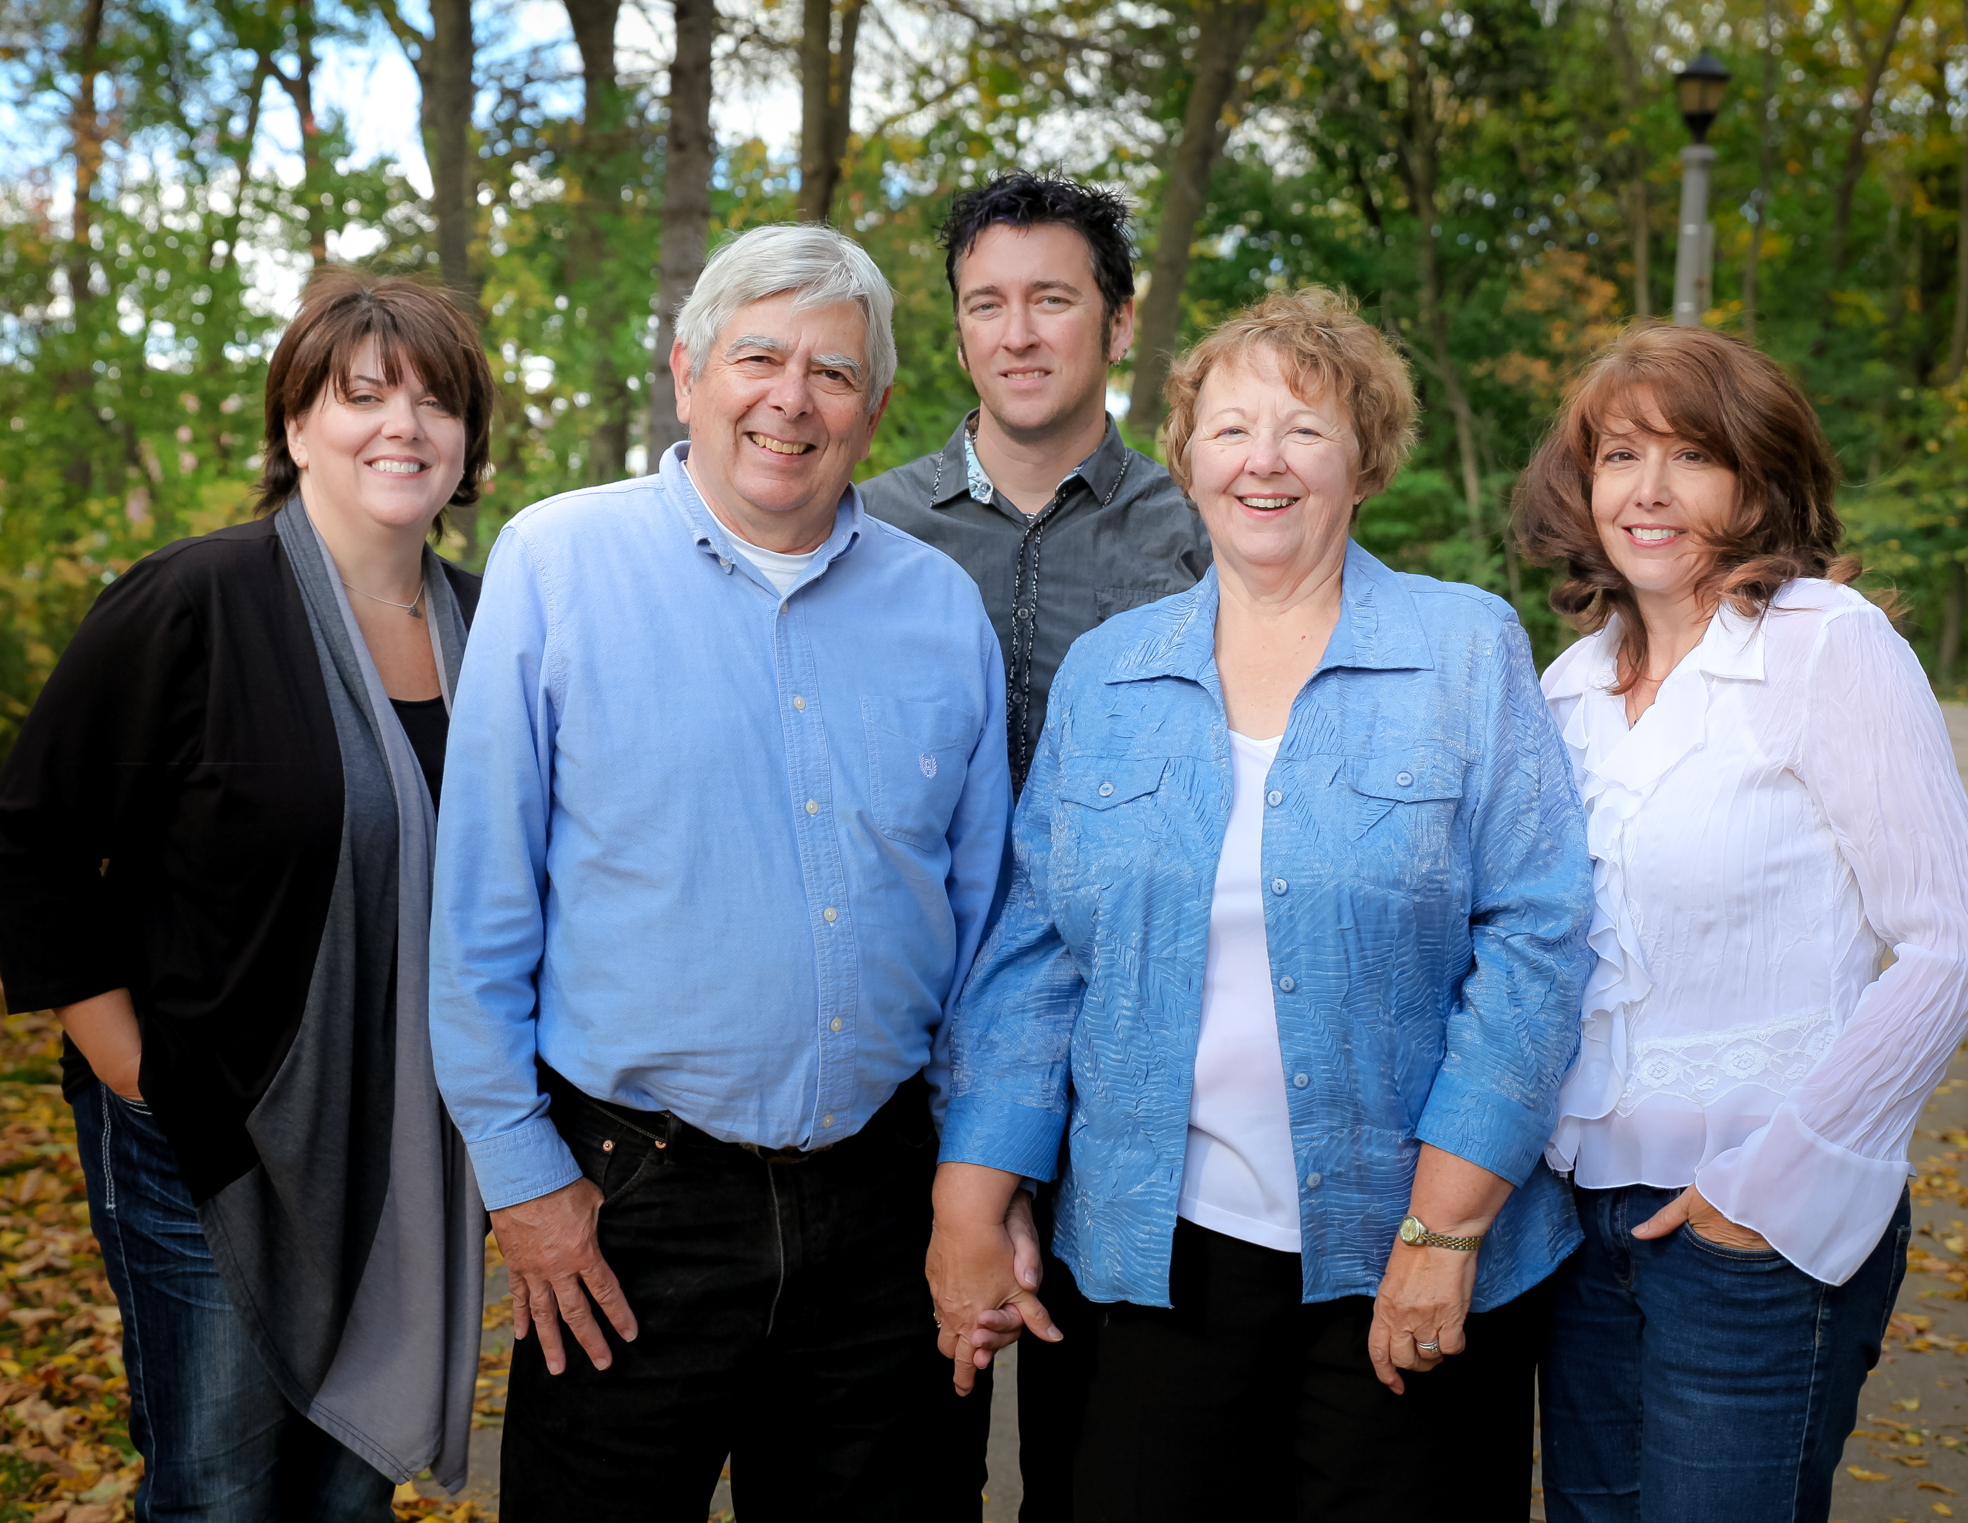 Pesch Family Portraits 2015 (64 of 83).jpg